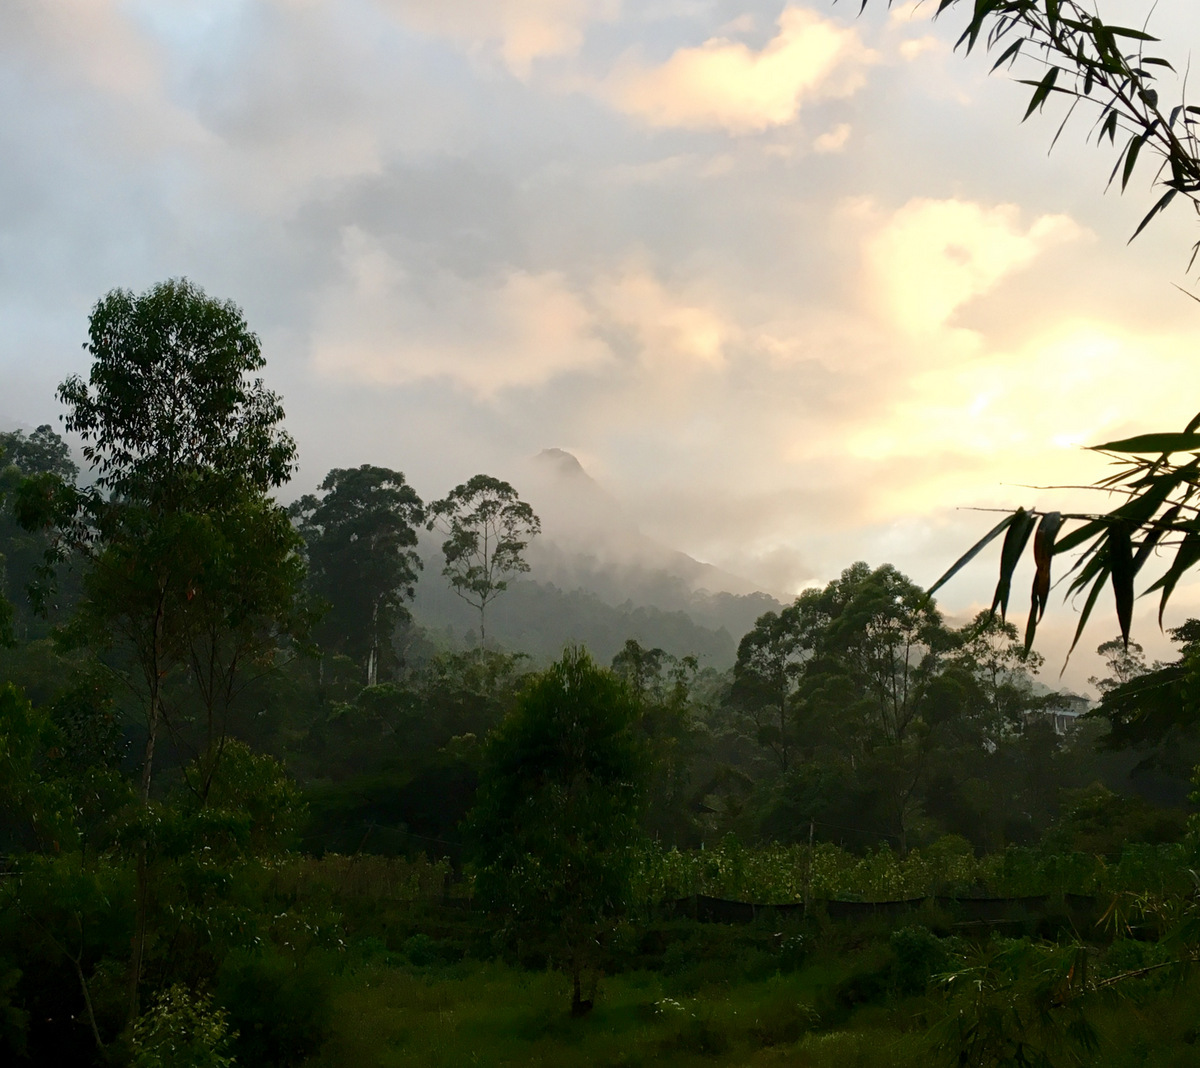 Etap 5: Adam's Peak. Schodami do słońca 14